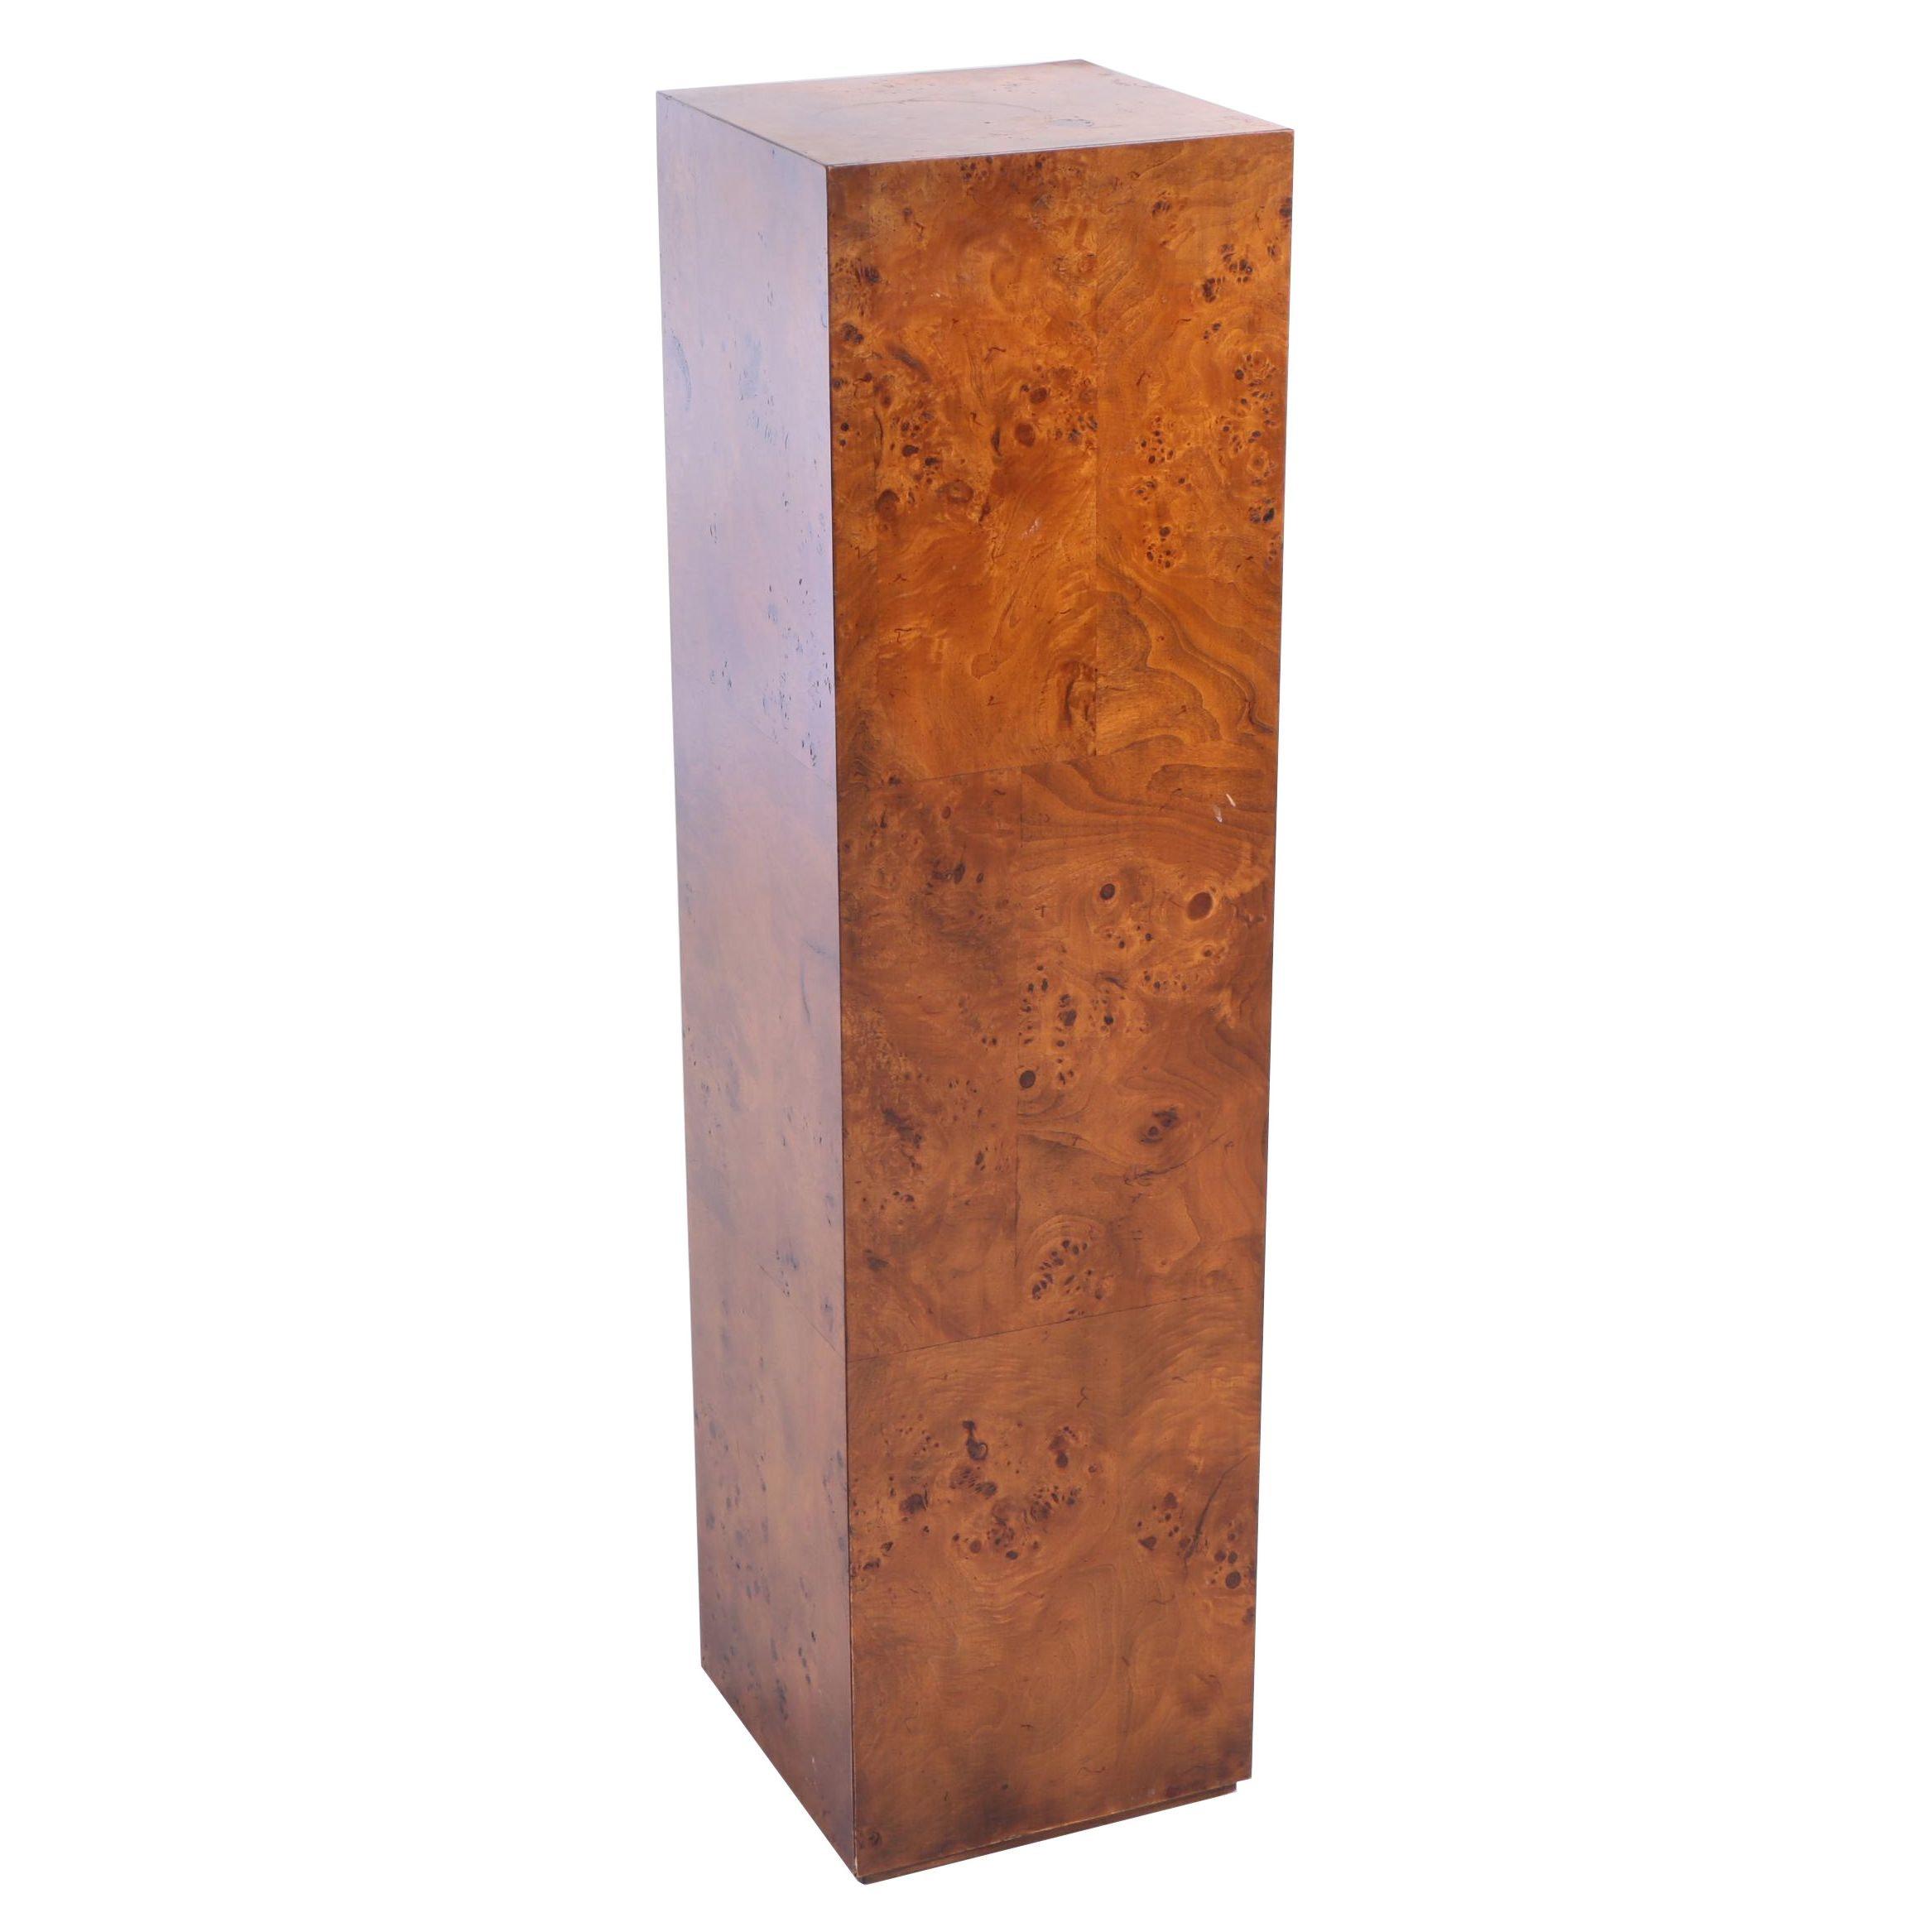 Burlwood Display Pedestal, Late 20th Century